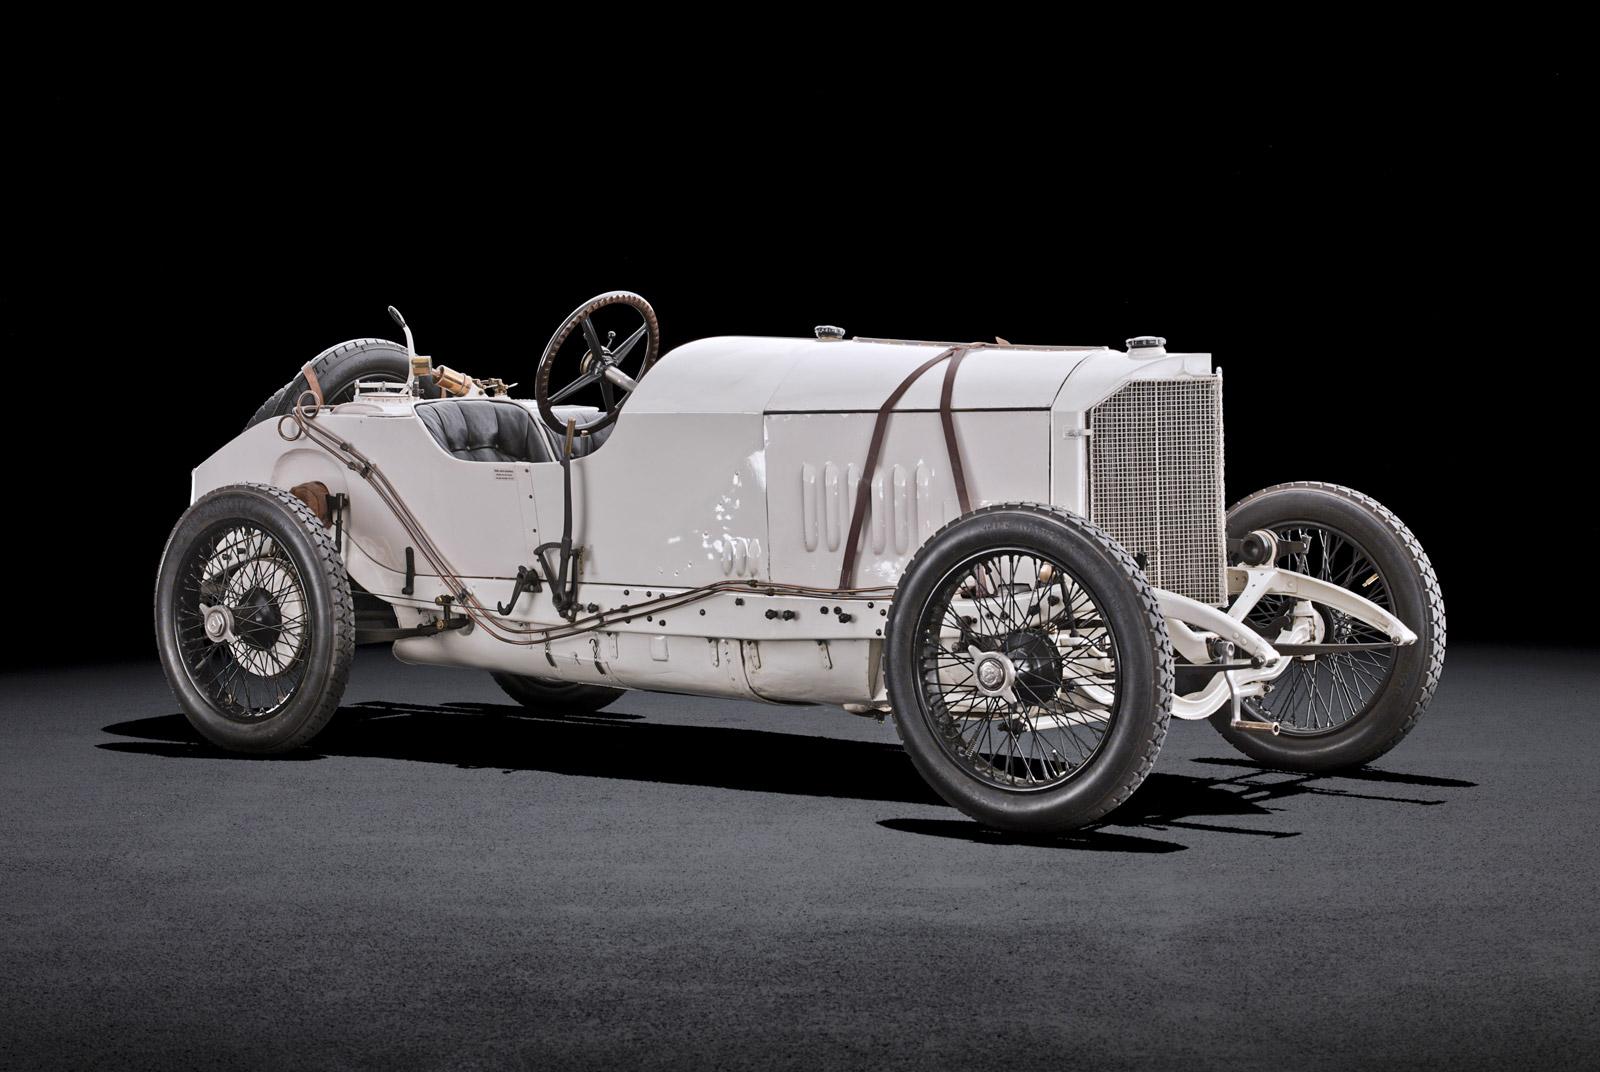 mercedes to celebrate motorsport history at goodwood with 1914 grand prix racer. Black Bedroom Furniture Sets. Home Design Ideas